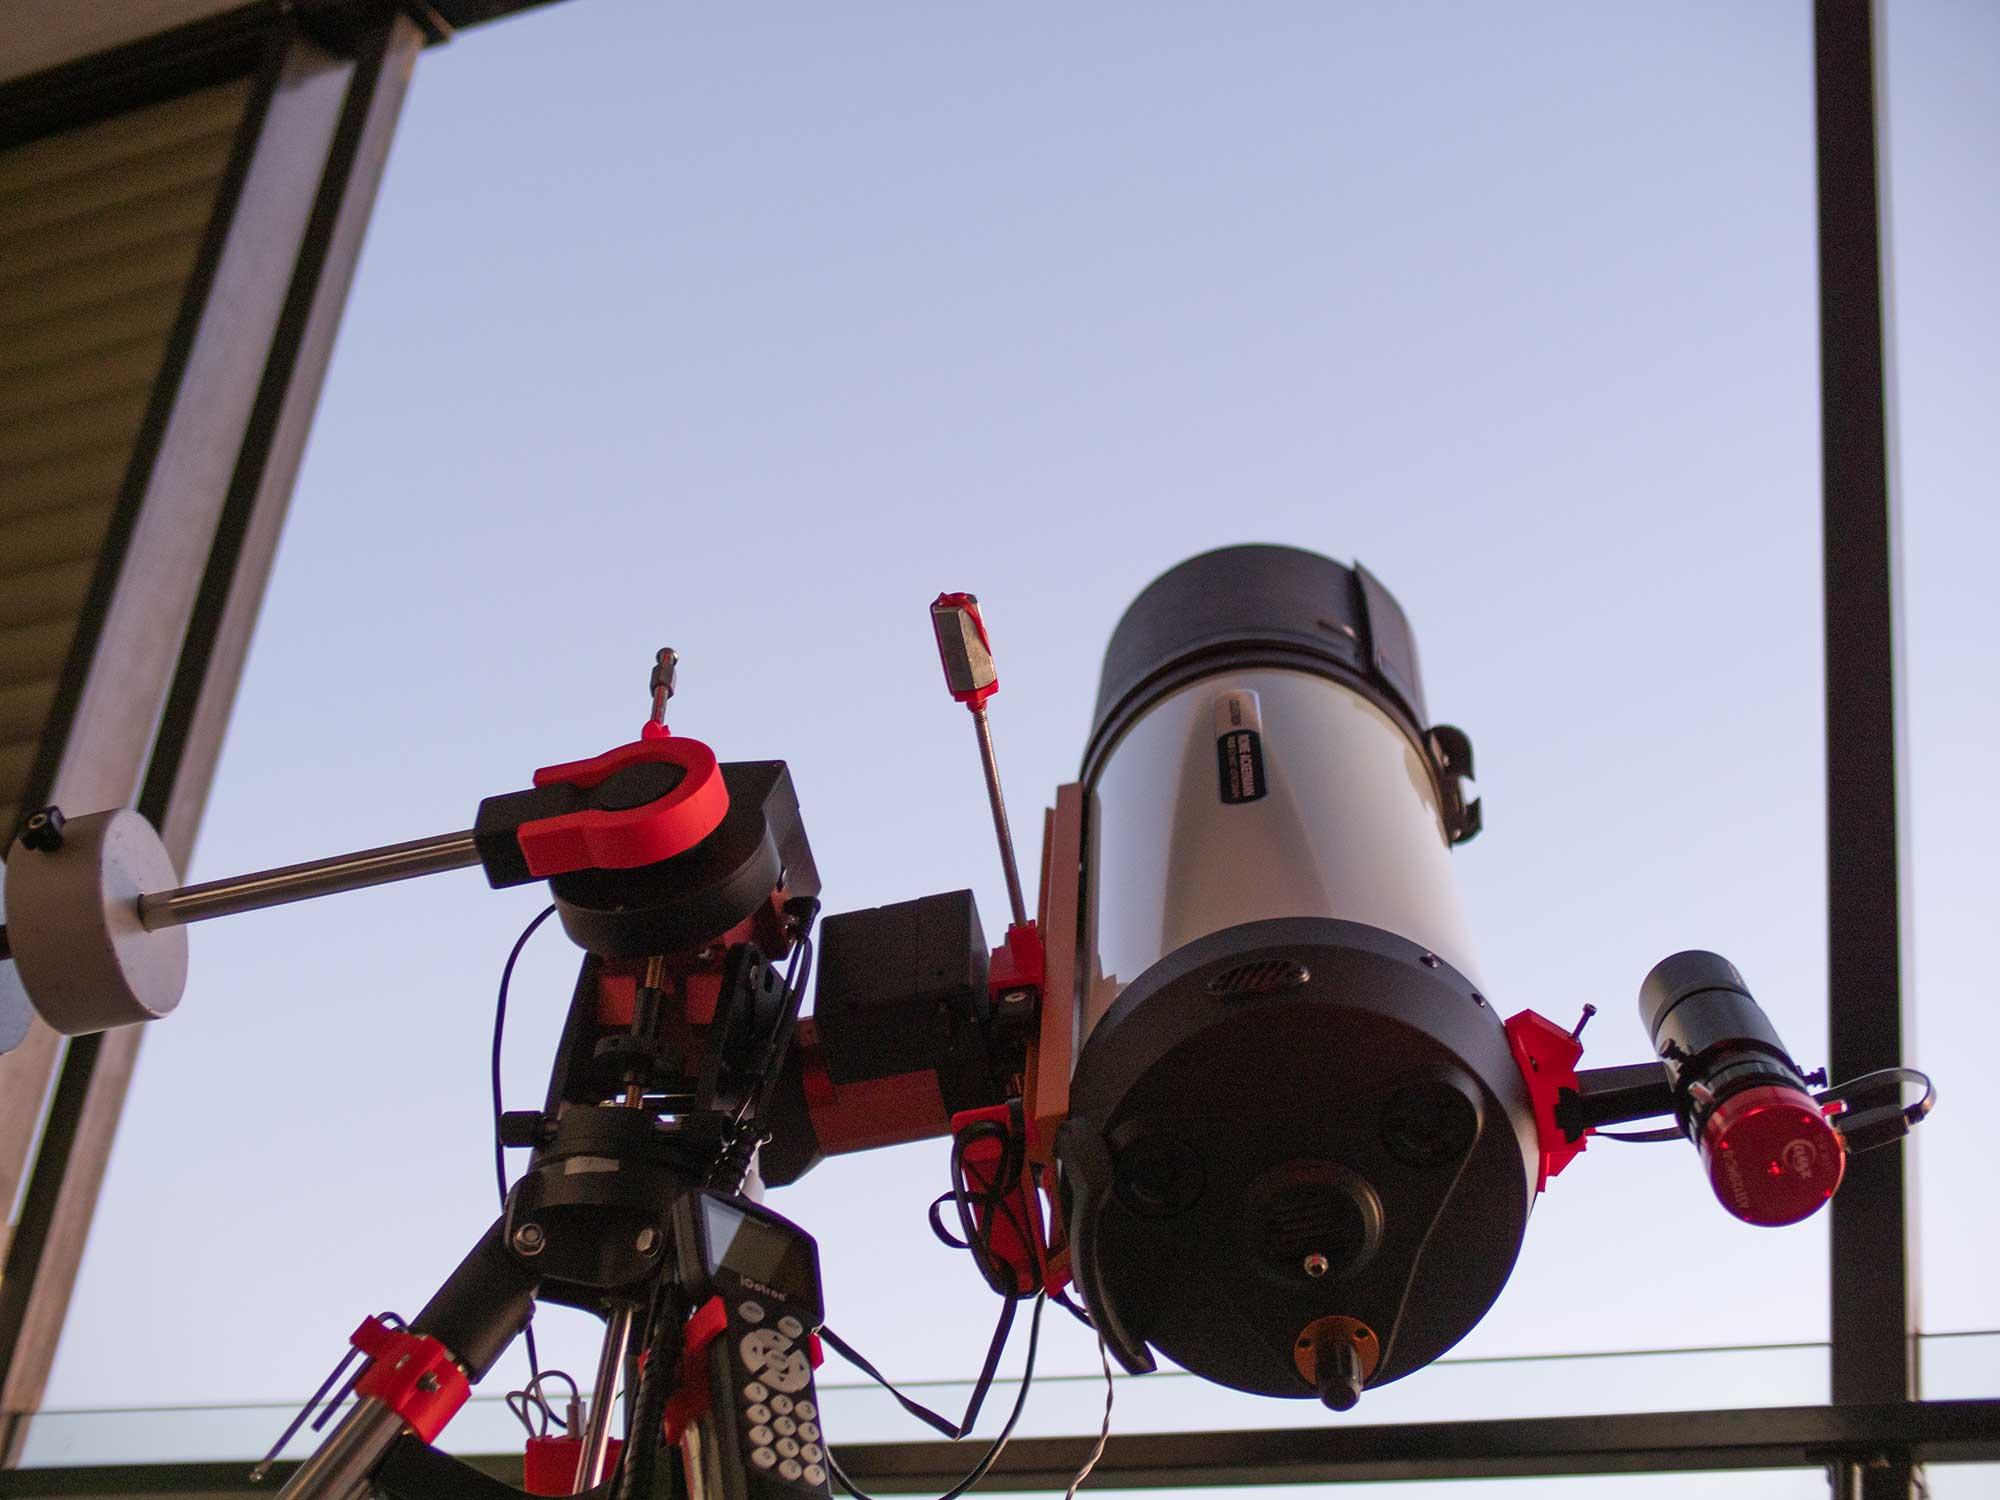 The RASA8 telescope on the Ioptron CEM40 mount